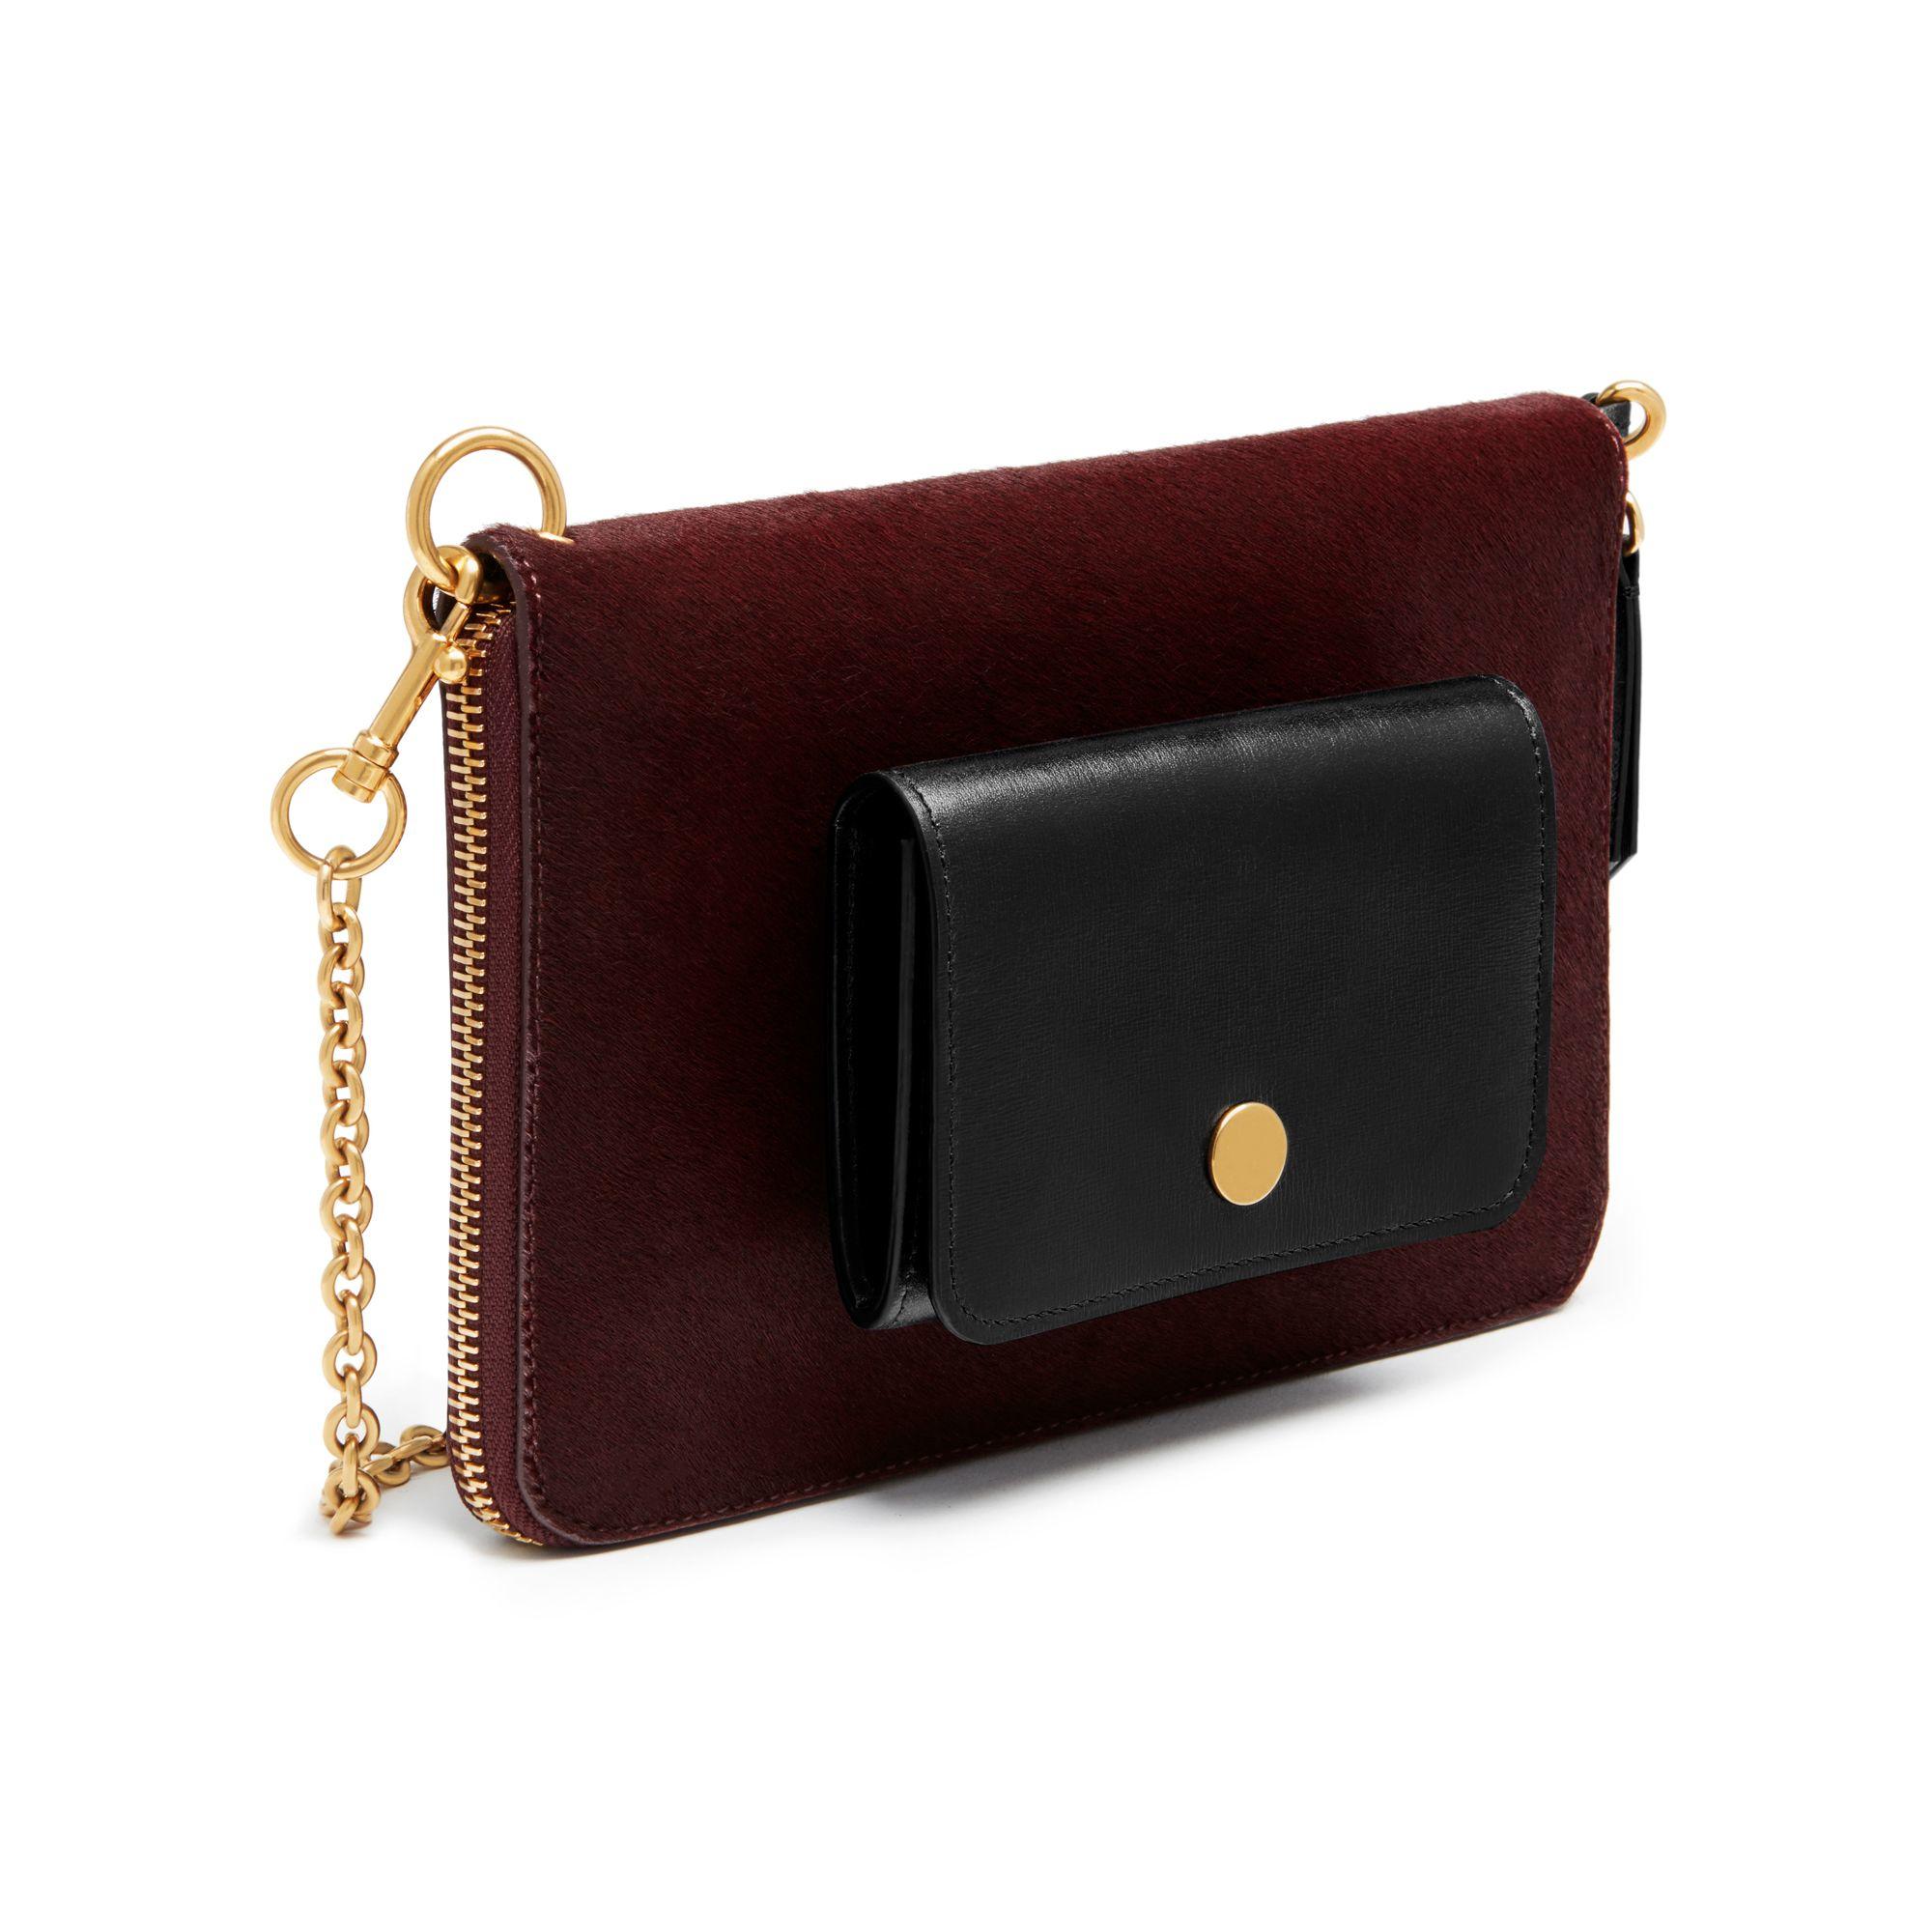 3e9921ff34f ... canada mulberry zip around clutch wallet lyst 7188d a5892